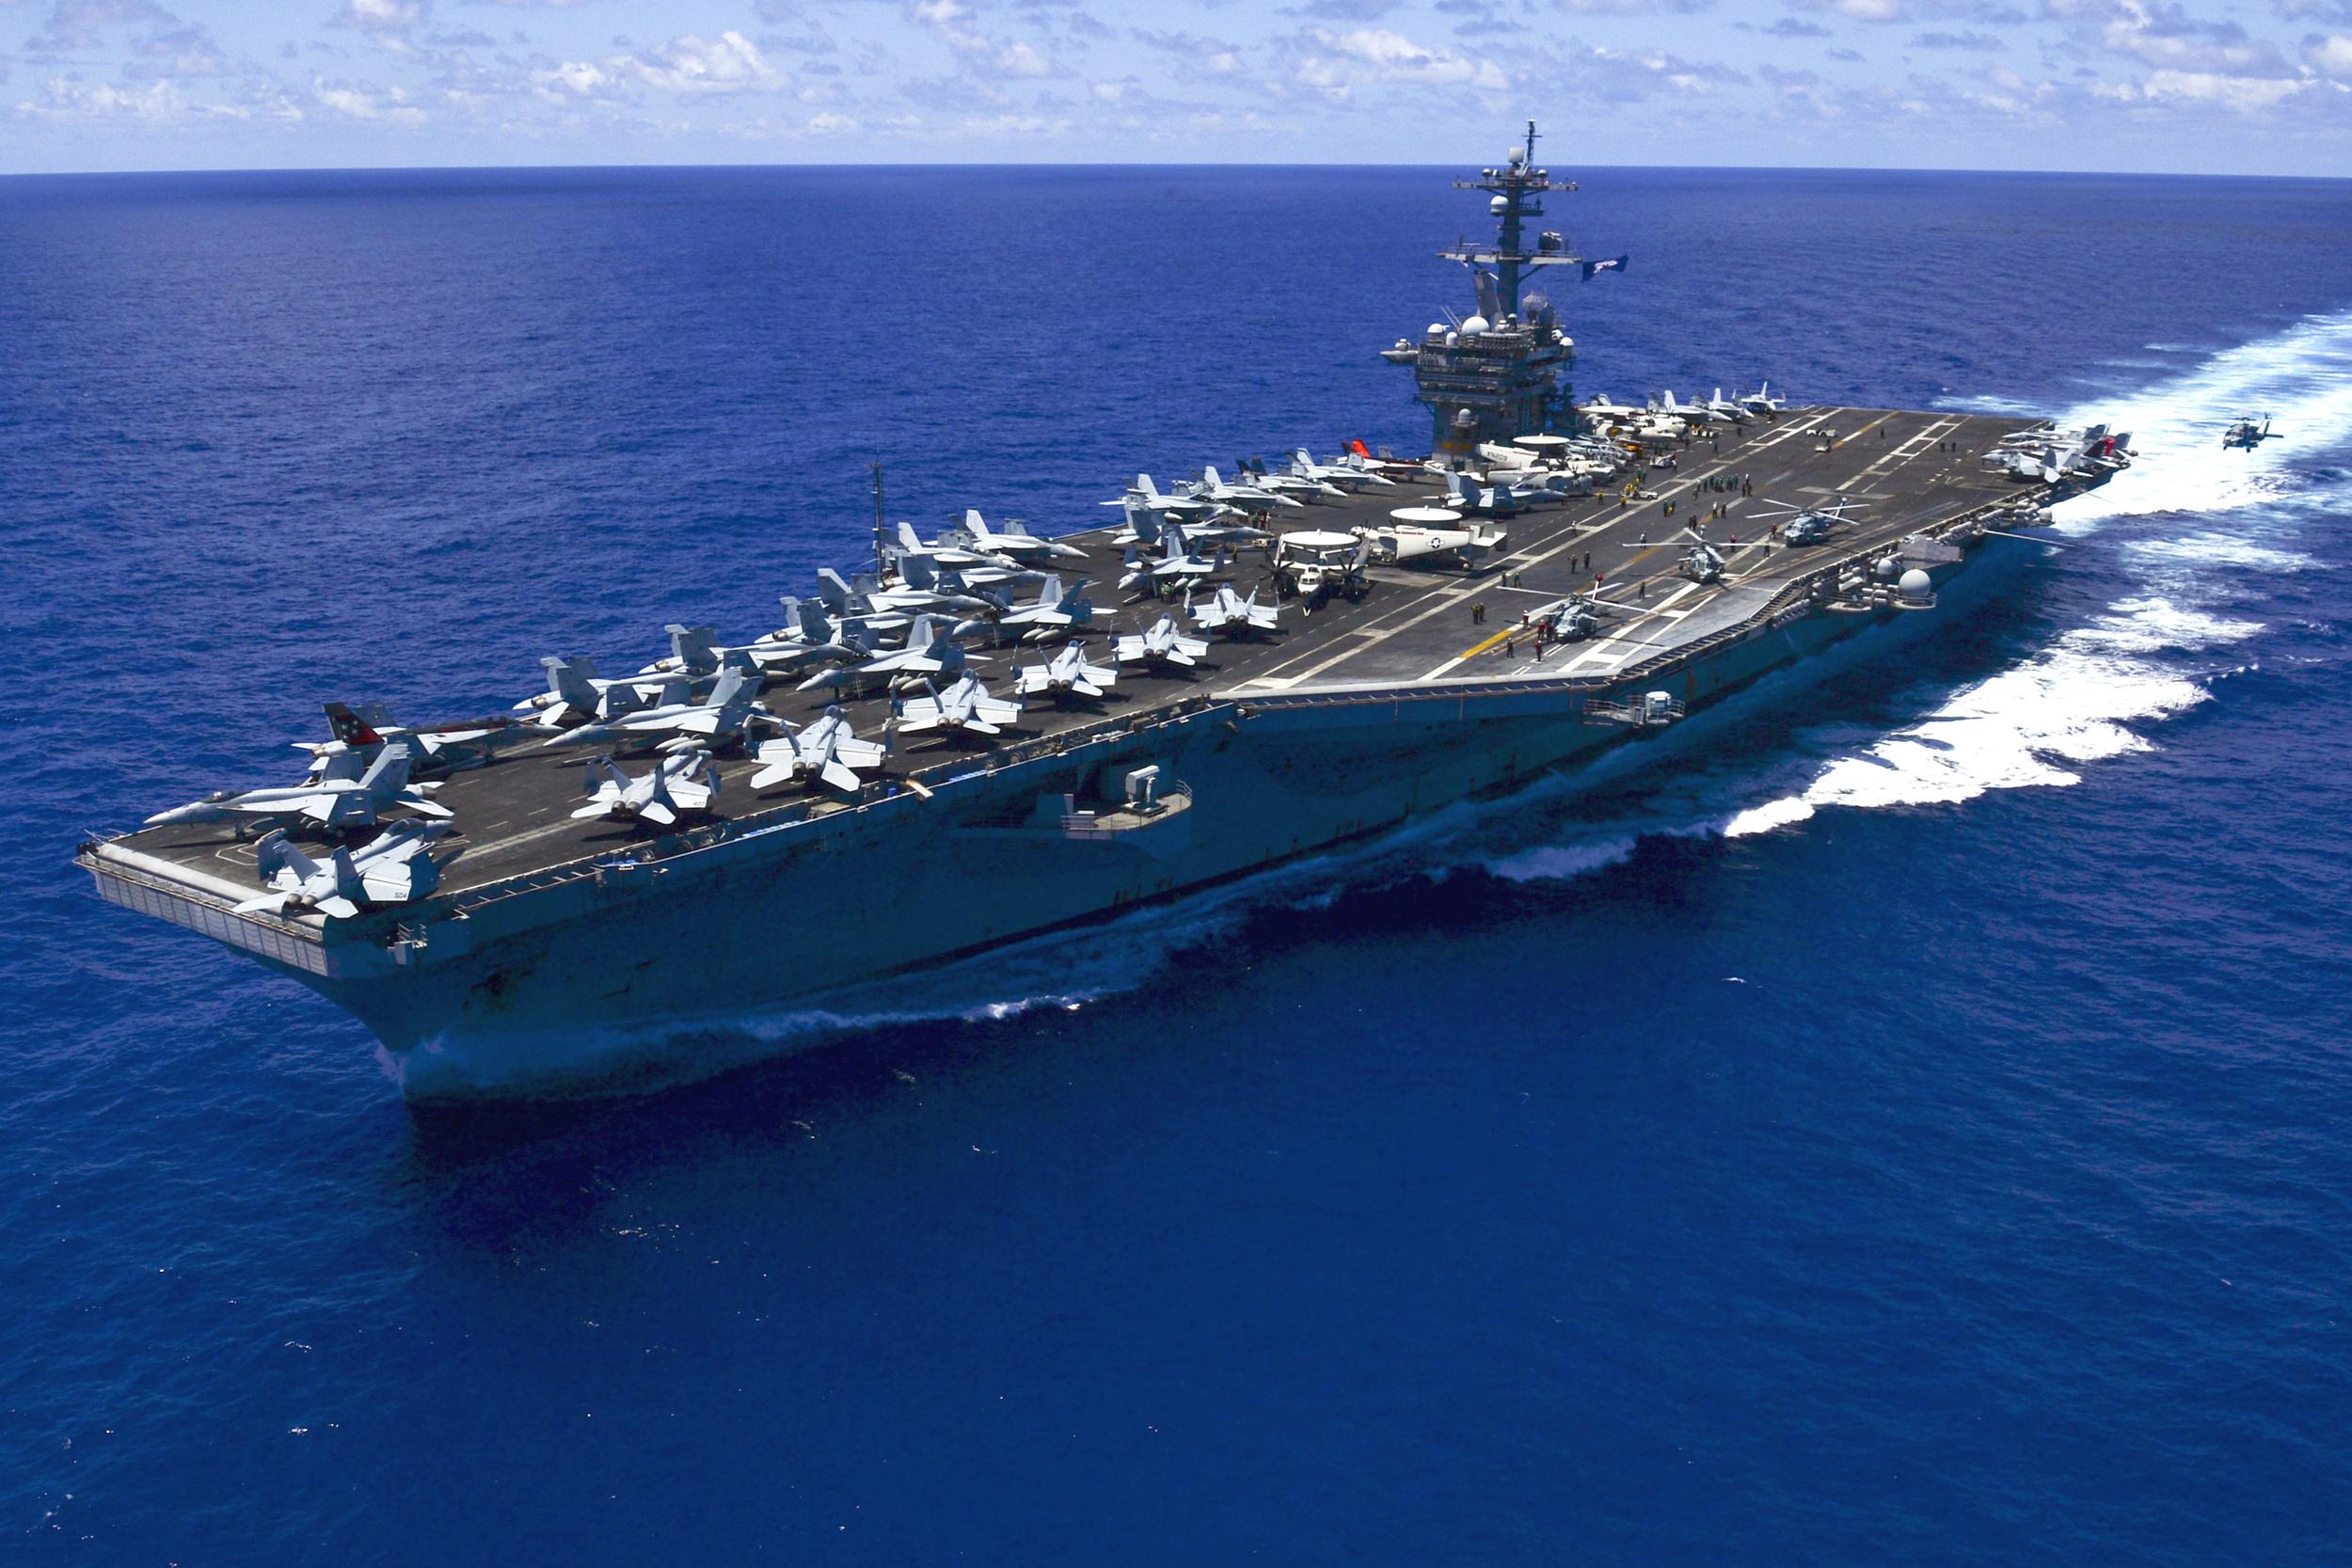 USS_Carl_Vinson_(CVN-70)_.JPG